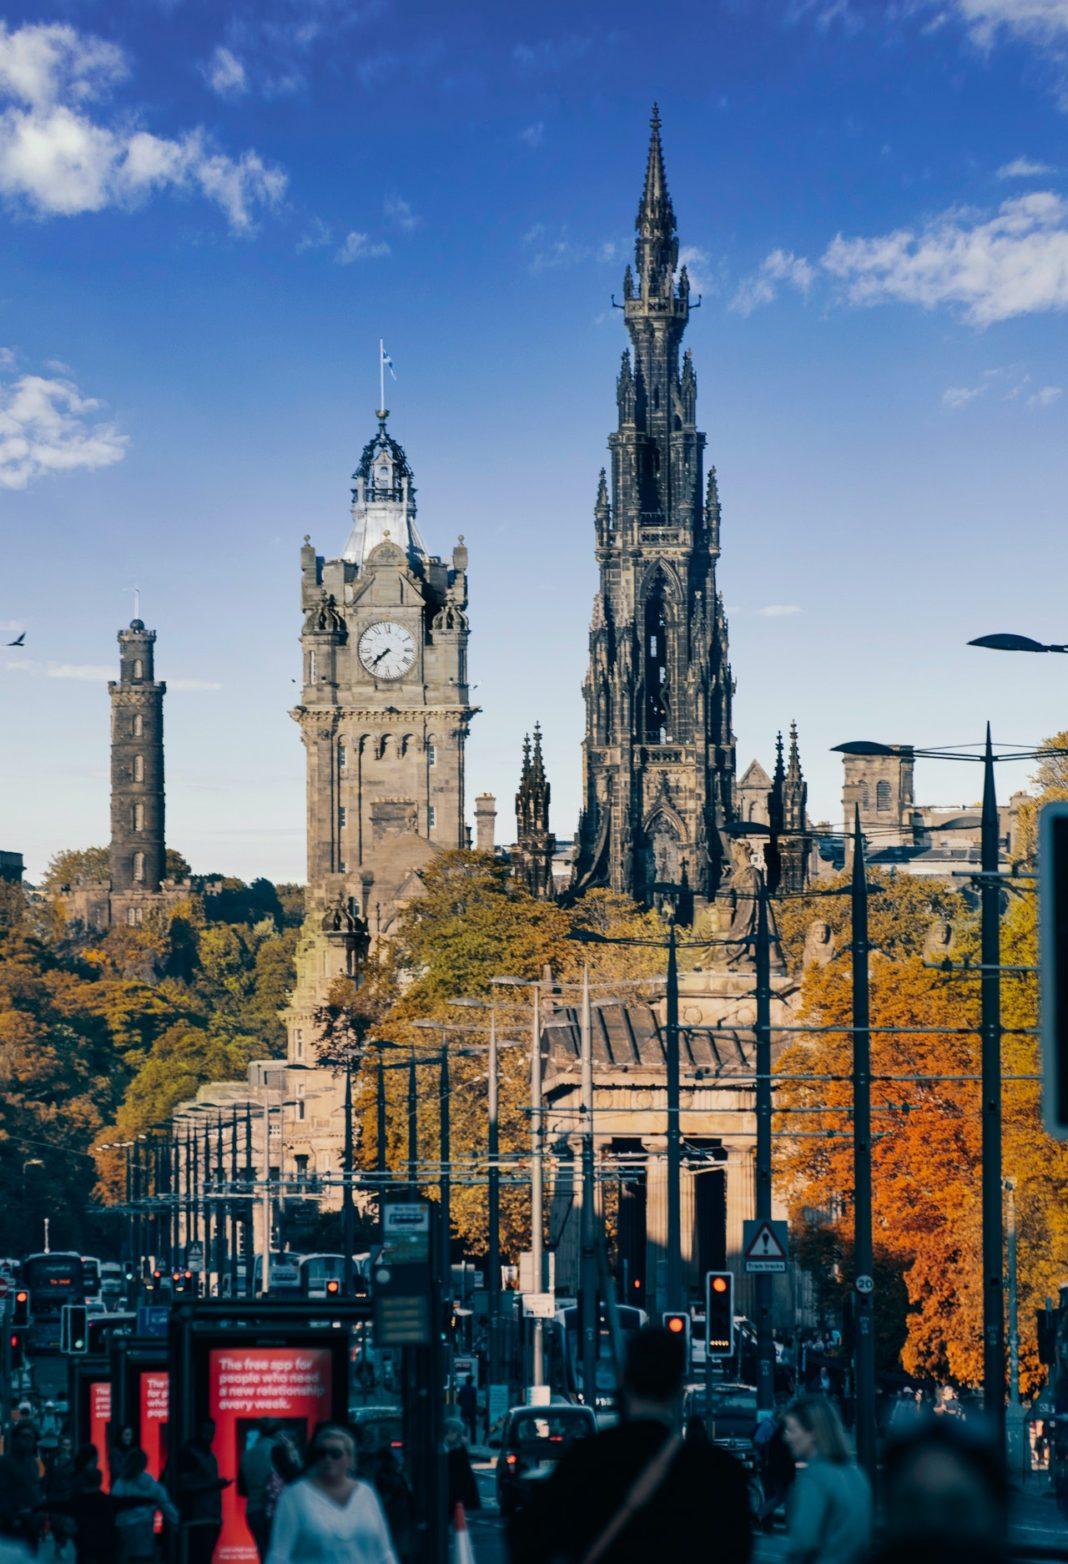 Edinburgh Princes Street - Photo by Vijit Bagh from Pexels